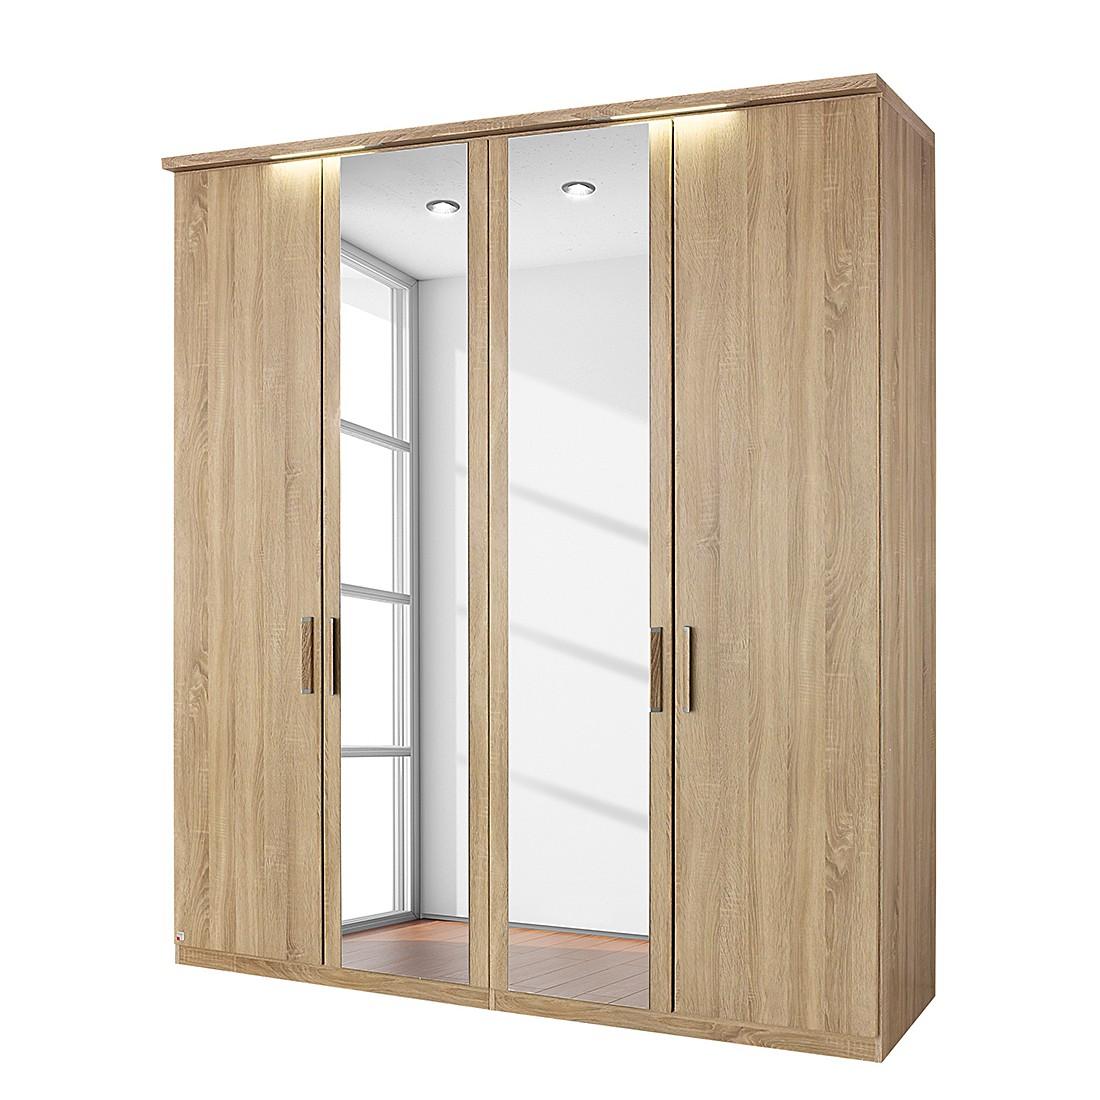 goedkoop energie A+ Draaideurkast Evelyn I Sonoma eikenhouten look Met verlichting 250cm 5 deurs 223cm Met kroonlijst Rauch Dialog